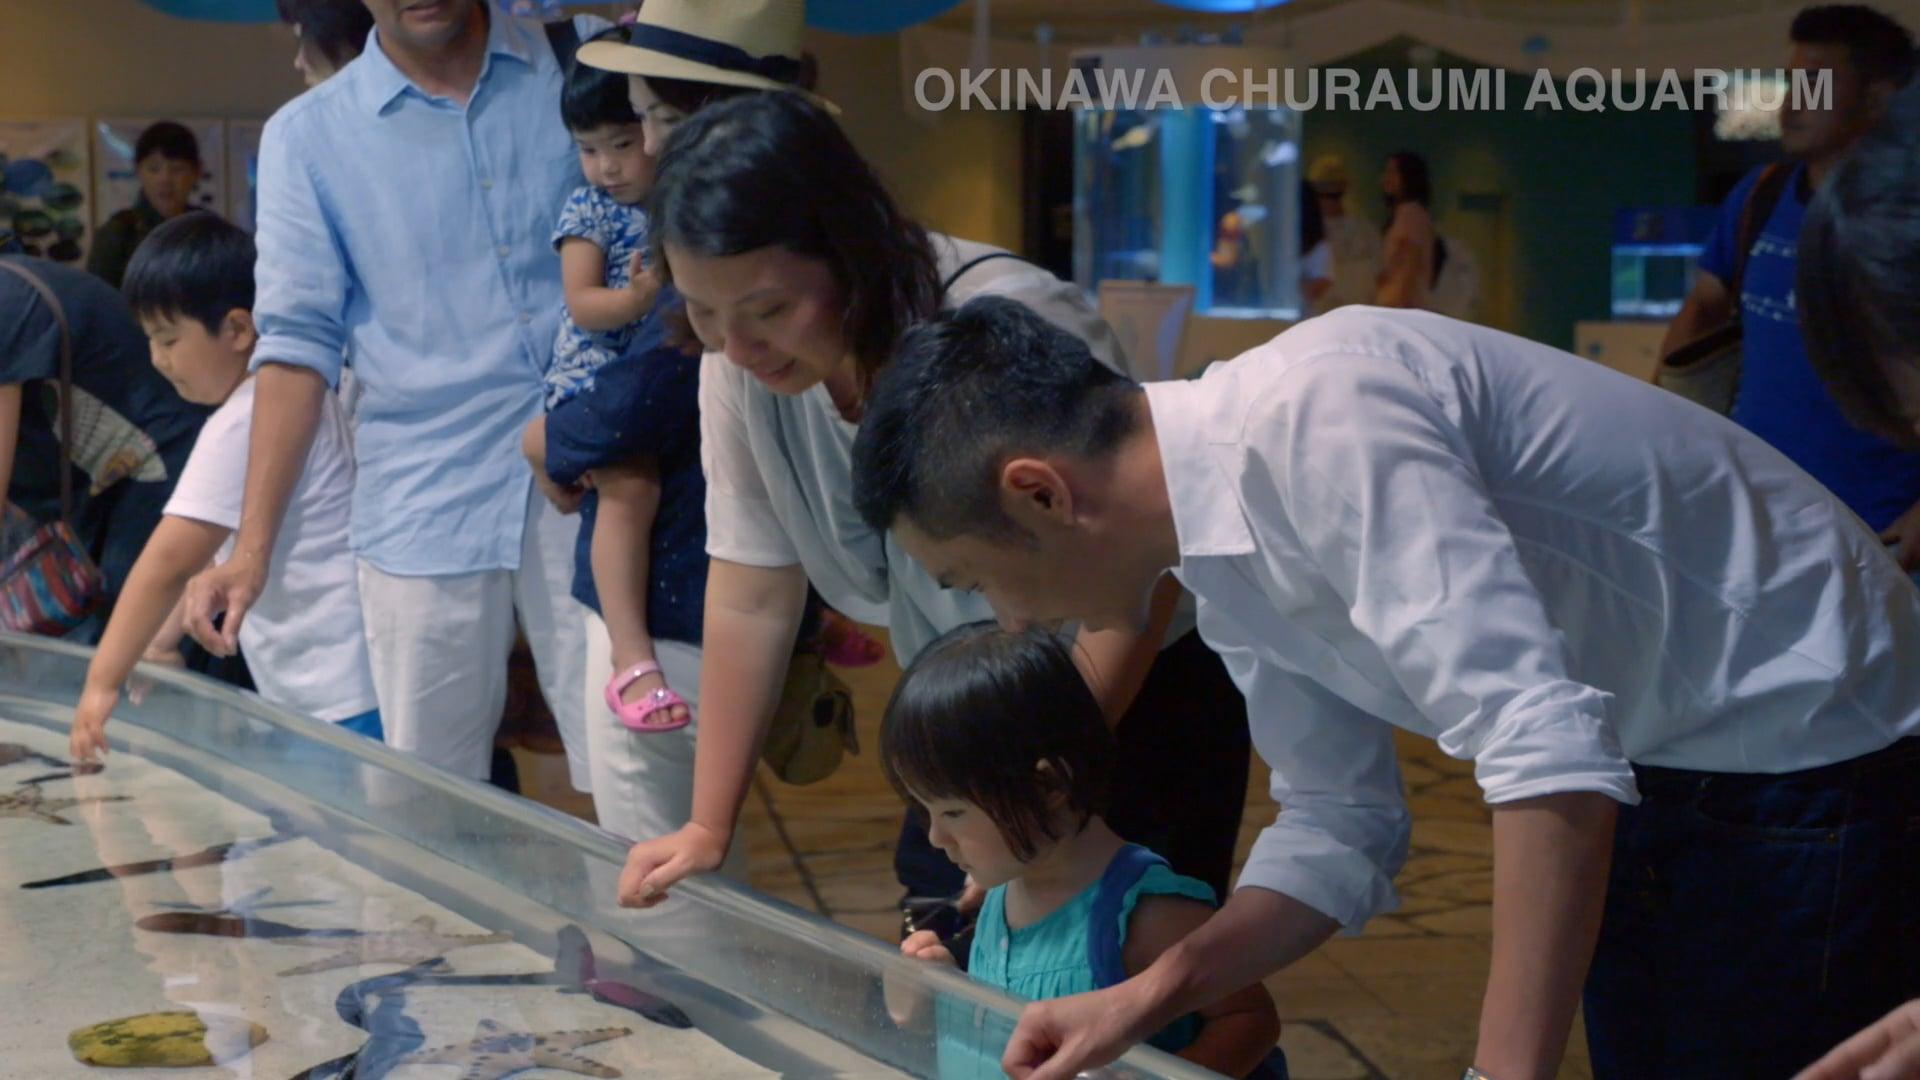 Okinawa Tourist Board